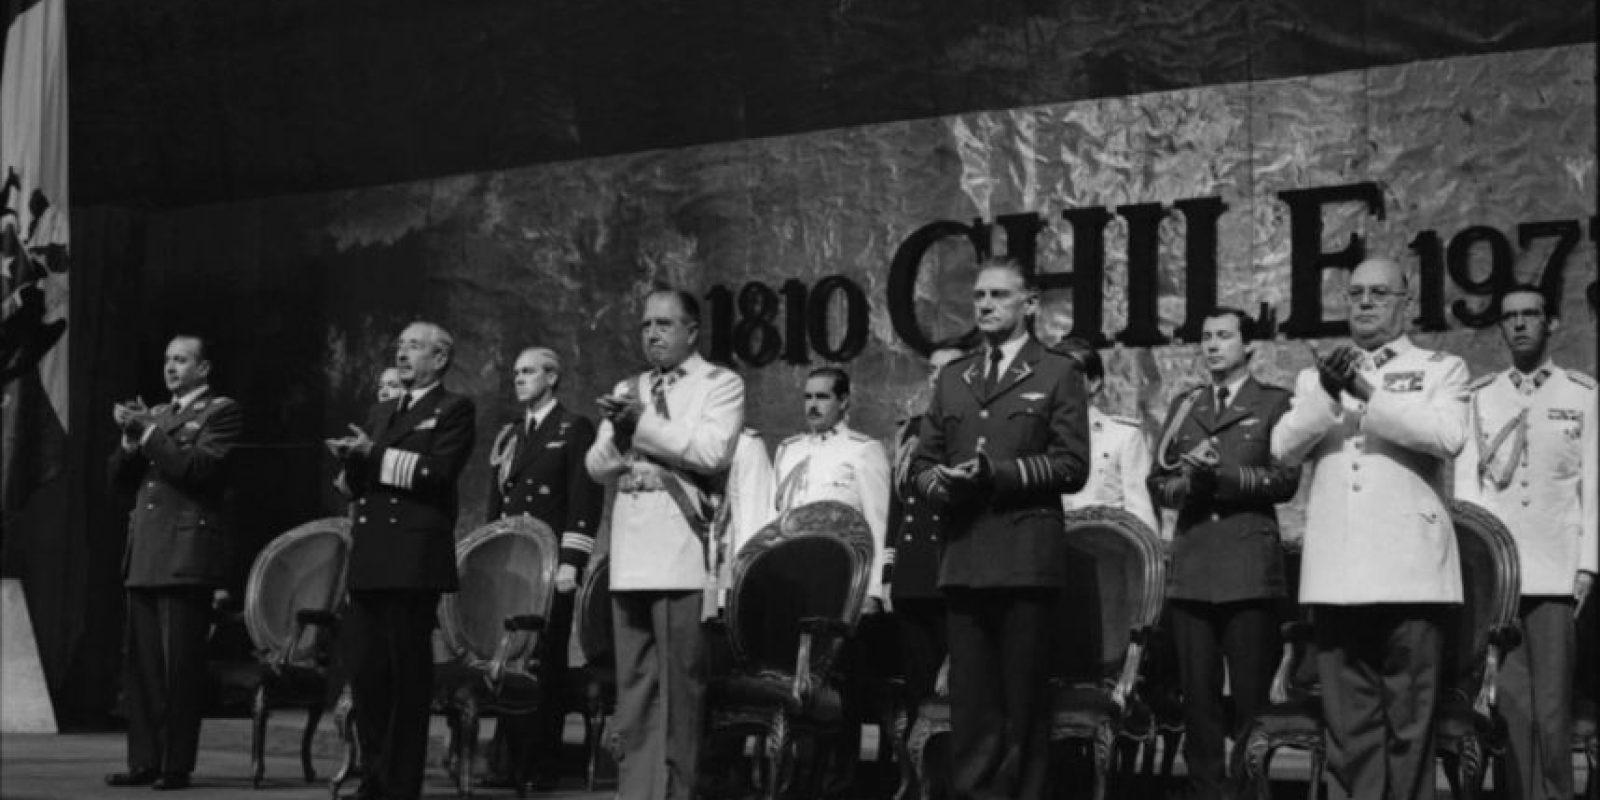 Inició el 11 de septiembre de 1973 con el golpe de estado que derrotó a Salvador Allende Foto:Wikimedia.org